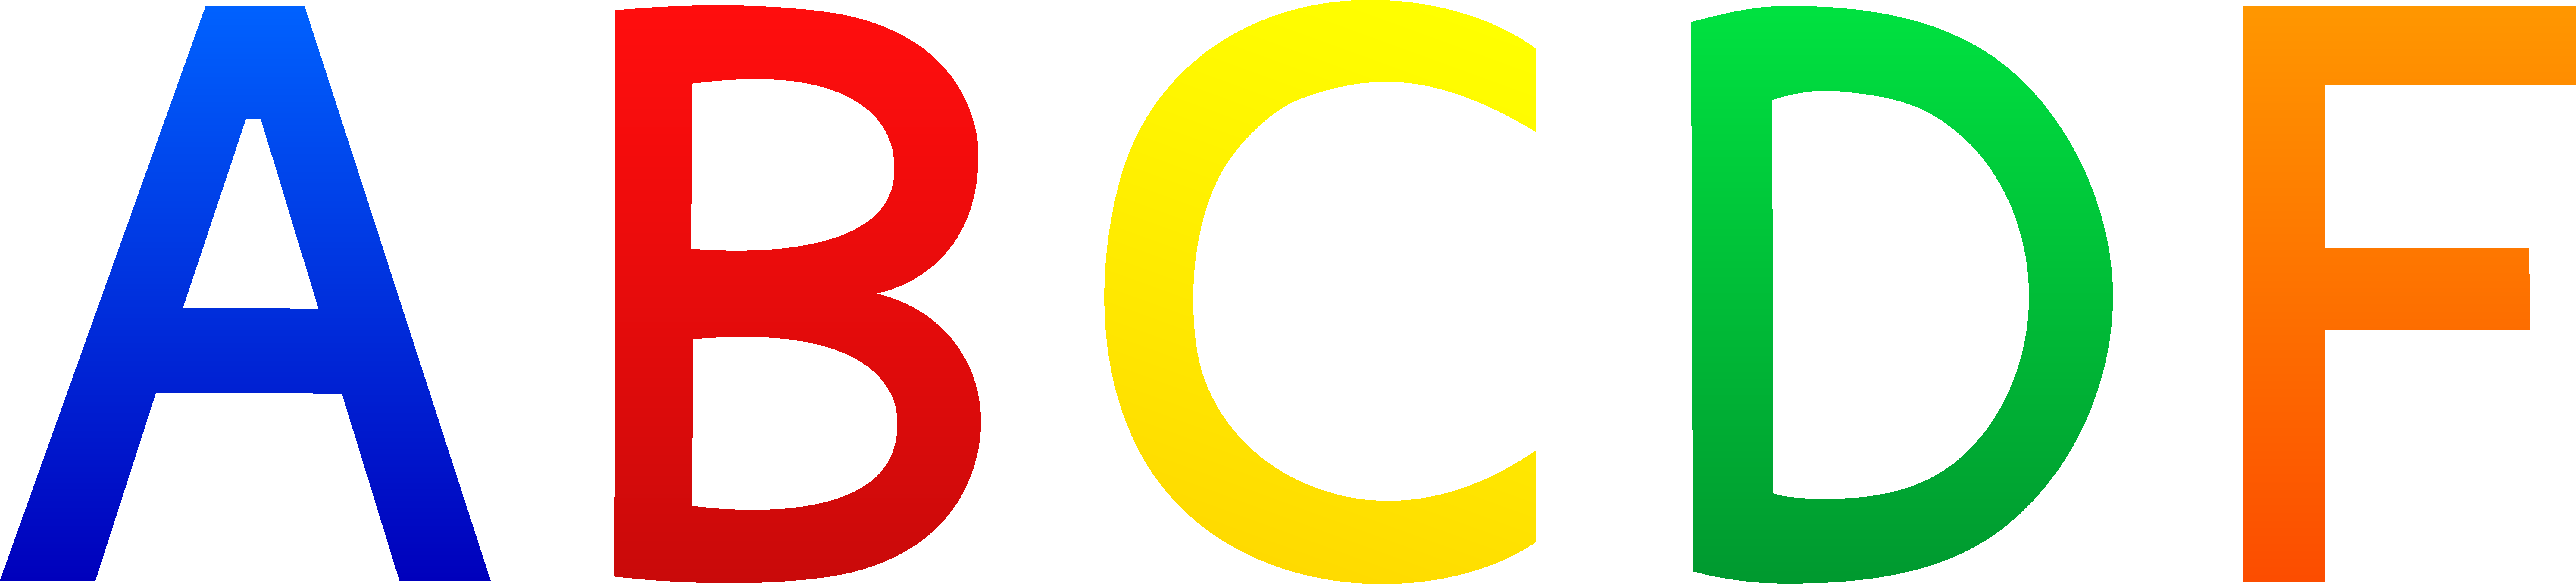 Free Alphabet Clipart Letters - Cliparts.co